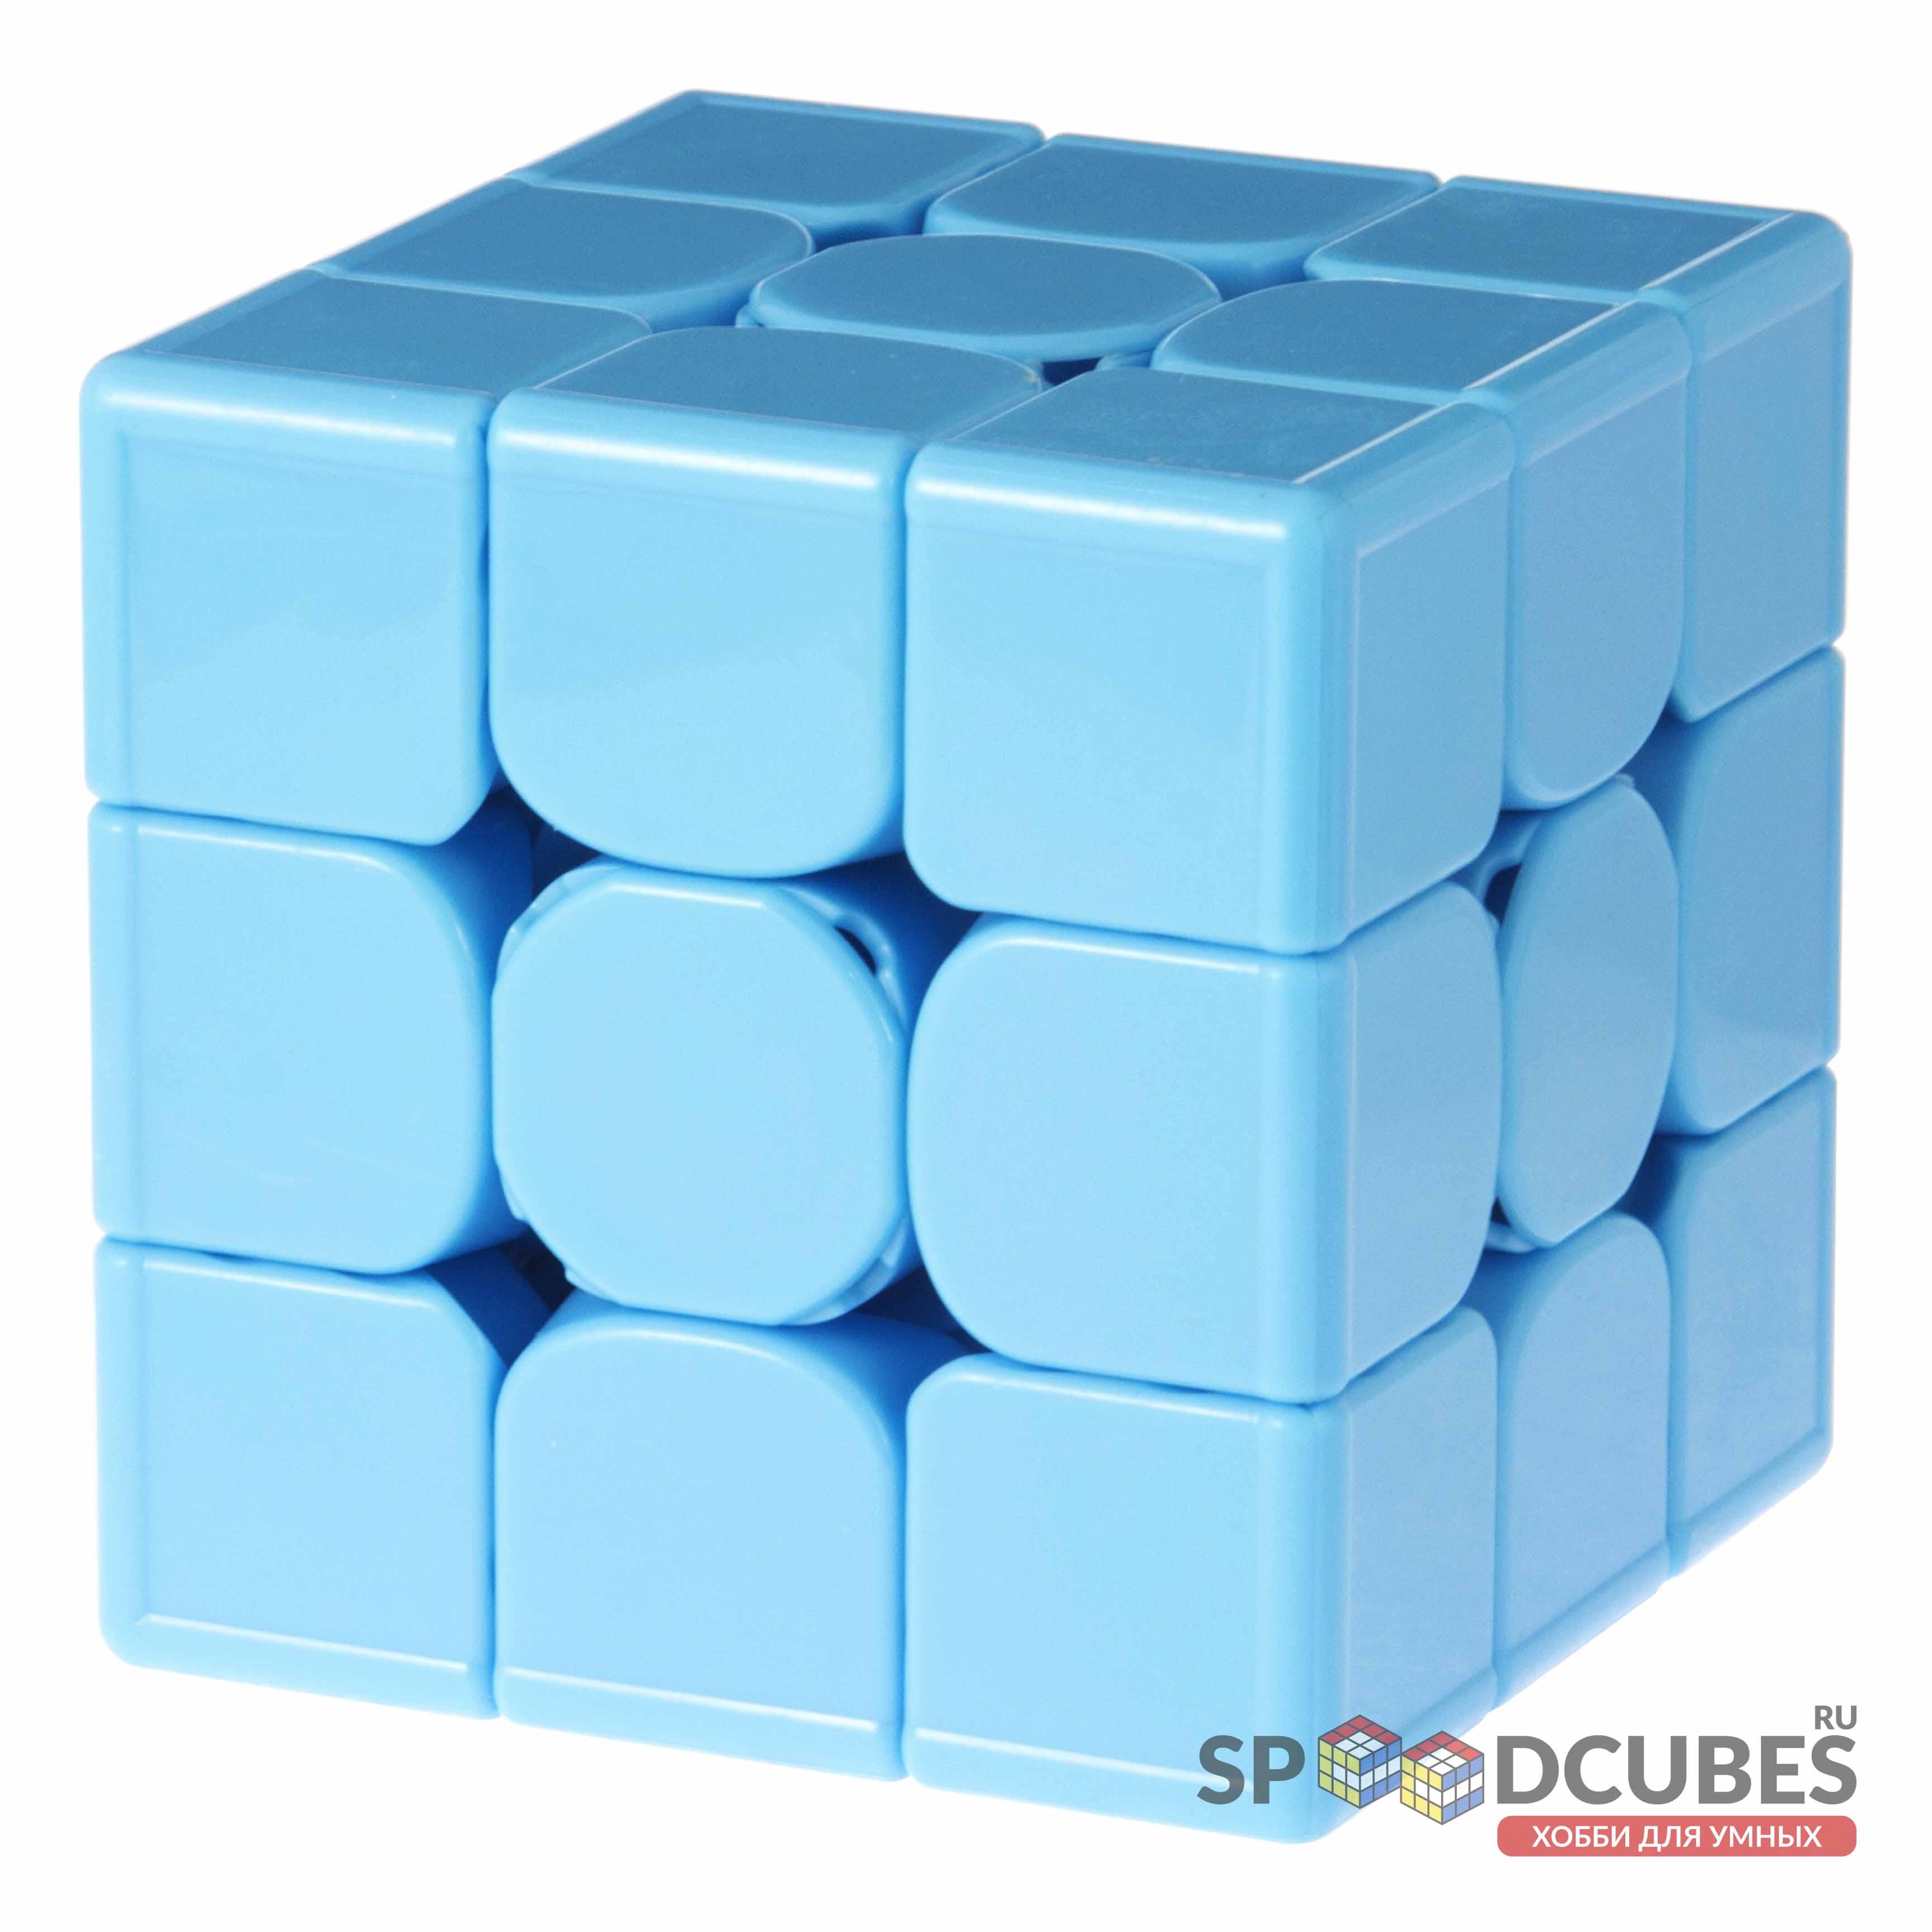 Moyu 3x3x3 Weilong GTS 3 M Blue (Limted Edition)